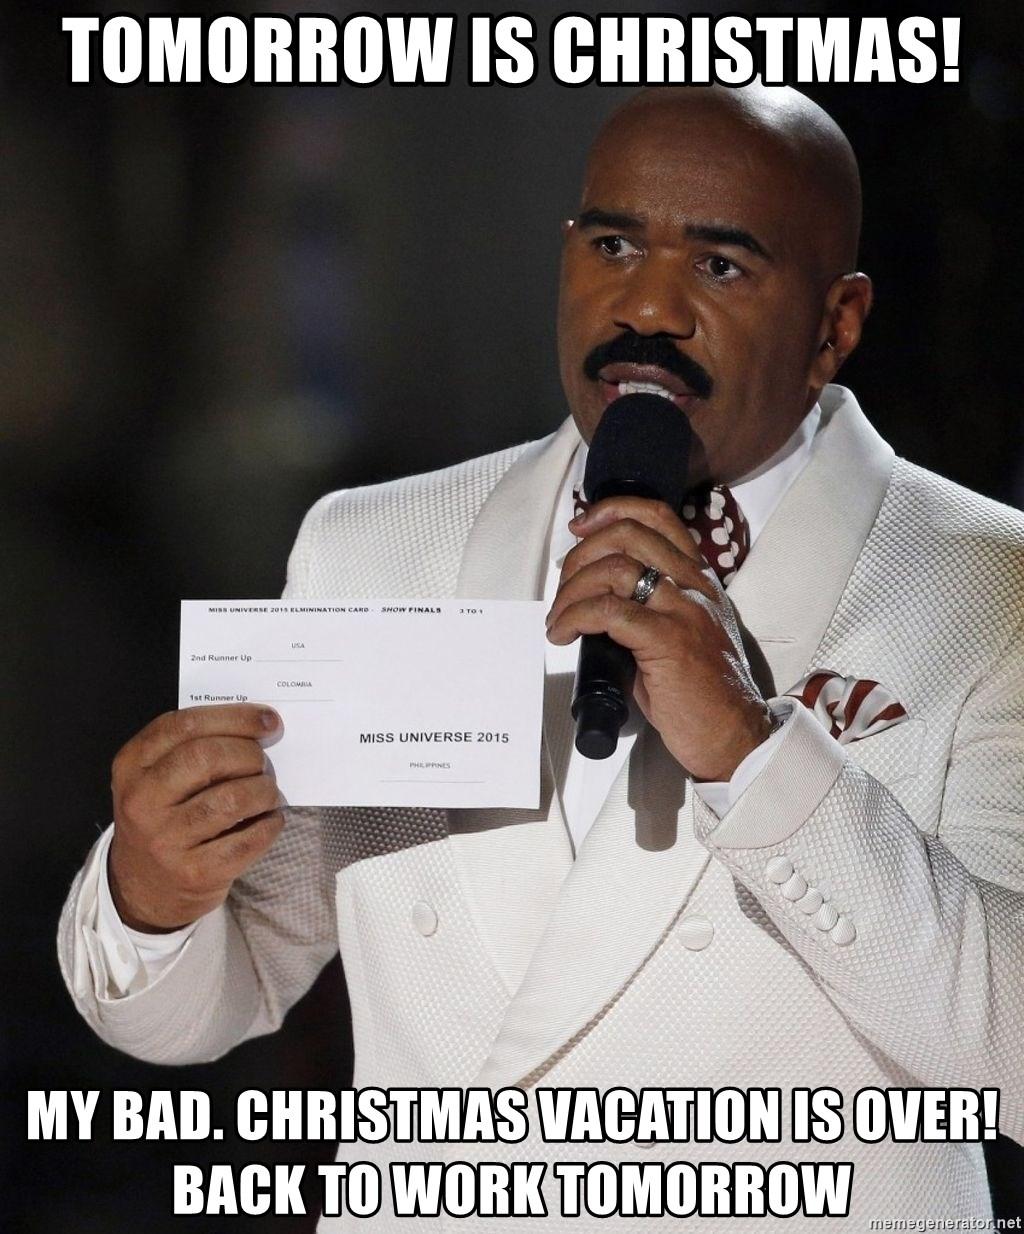 Tomorrow Is Christmas My Bad Christmas Vacation Is Over Back To Work Tomorrow Steve Harvey Miss Universe Meme Meme Generator